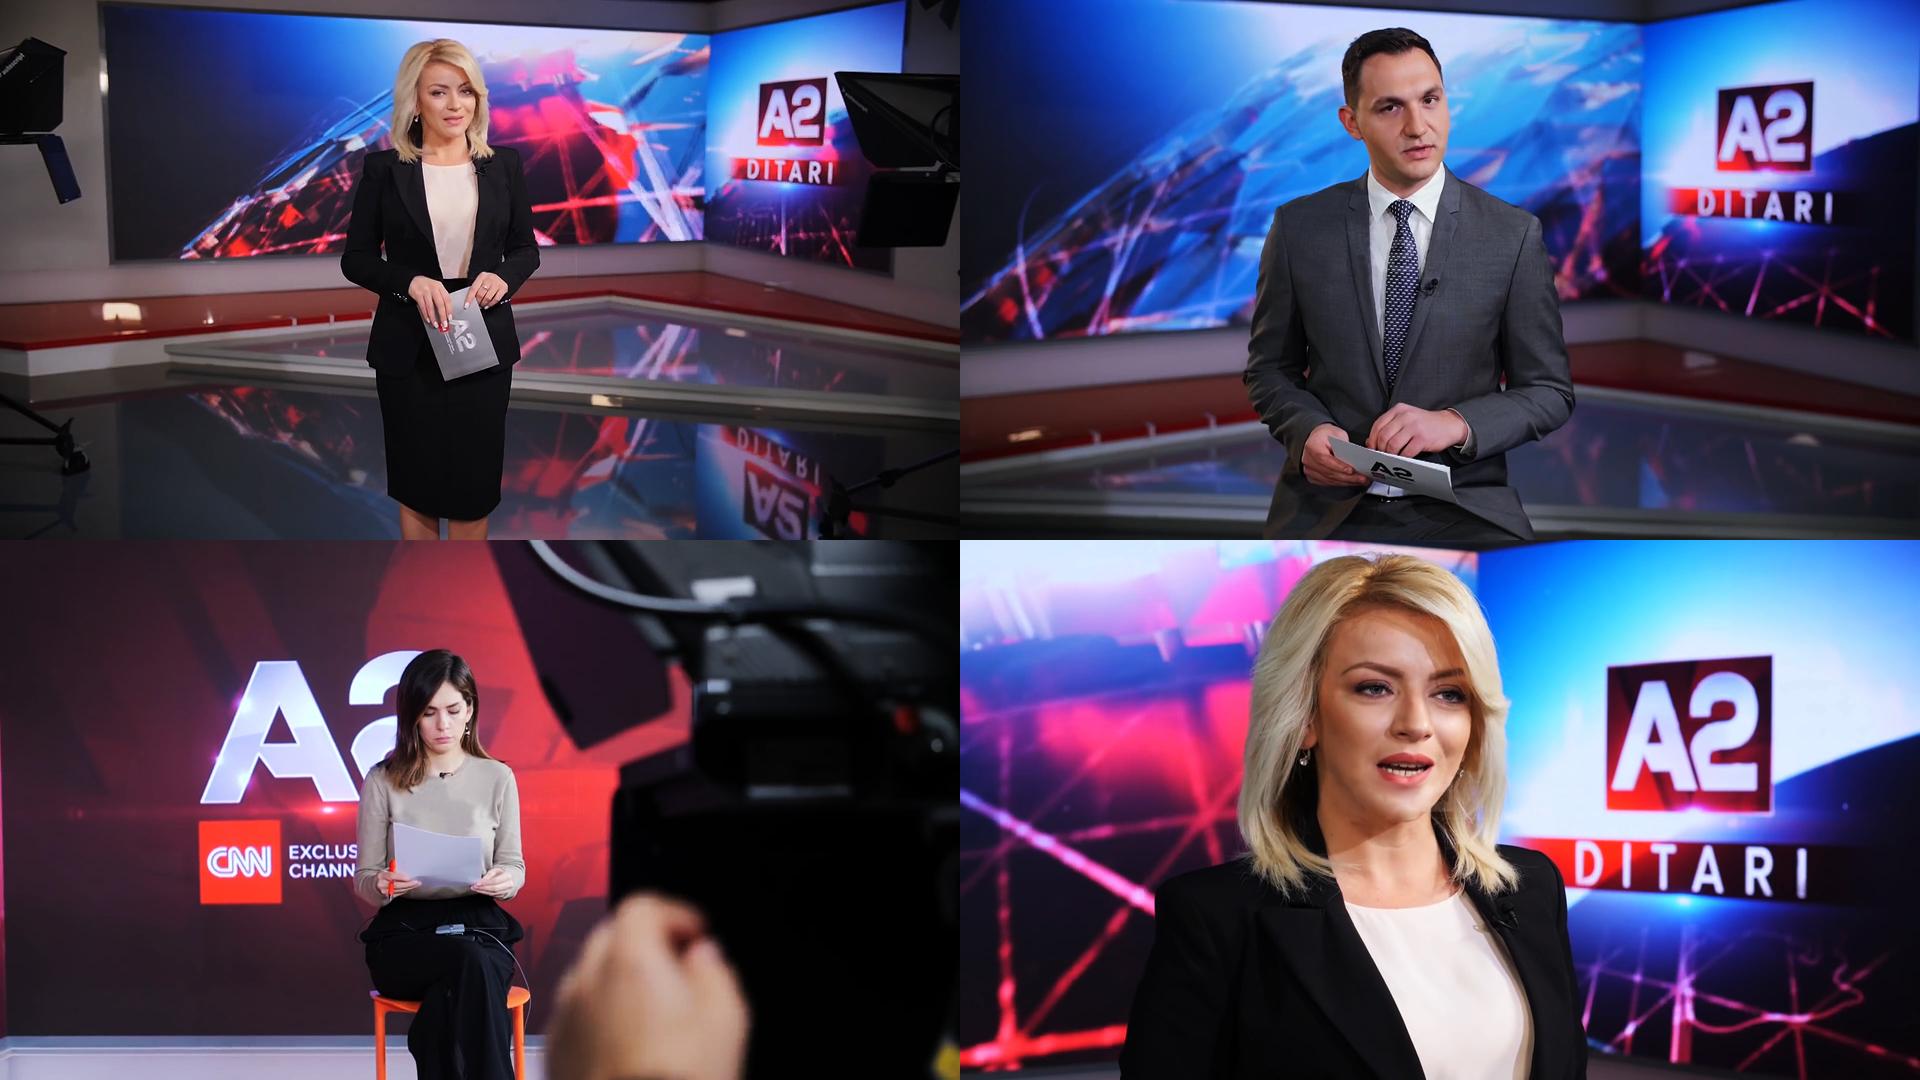 A2_CNN_ALBANIA_Broadcast_Design.jpg